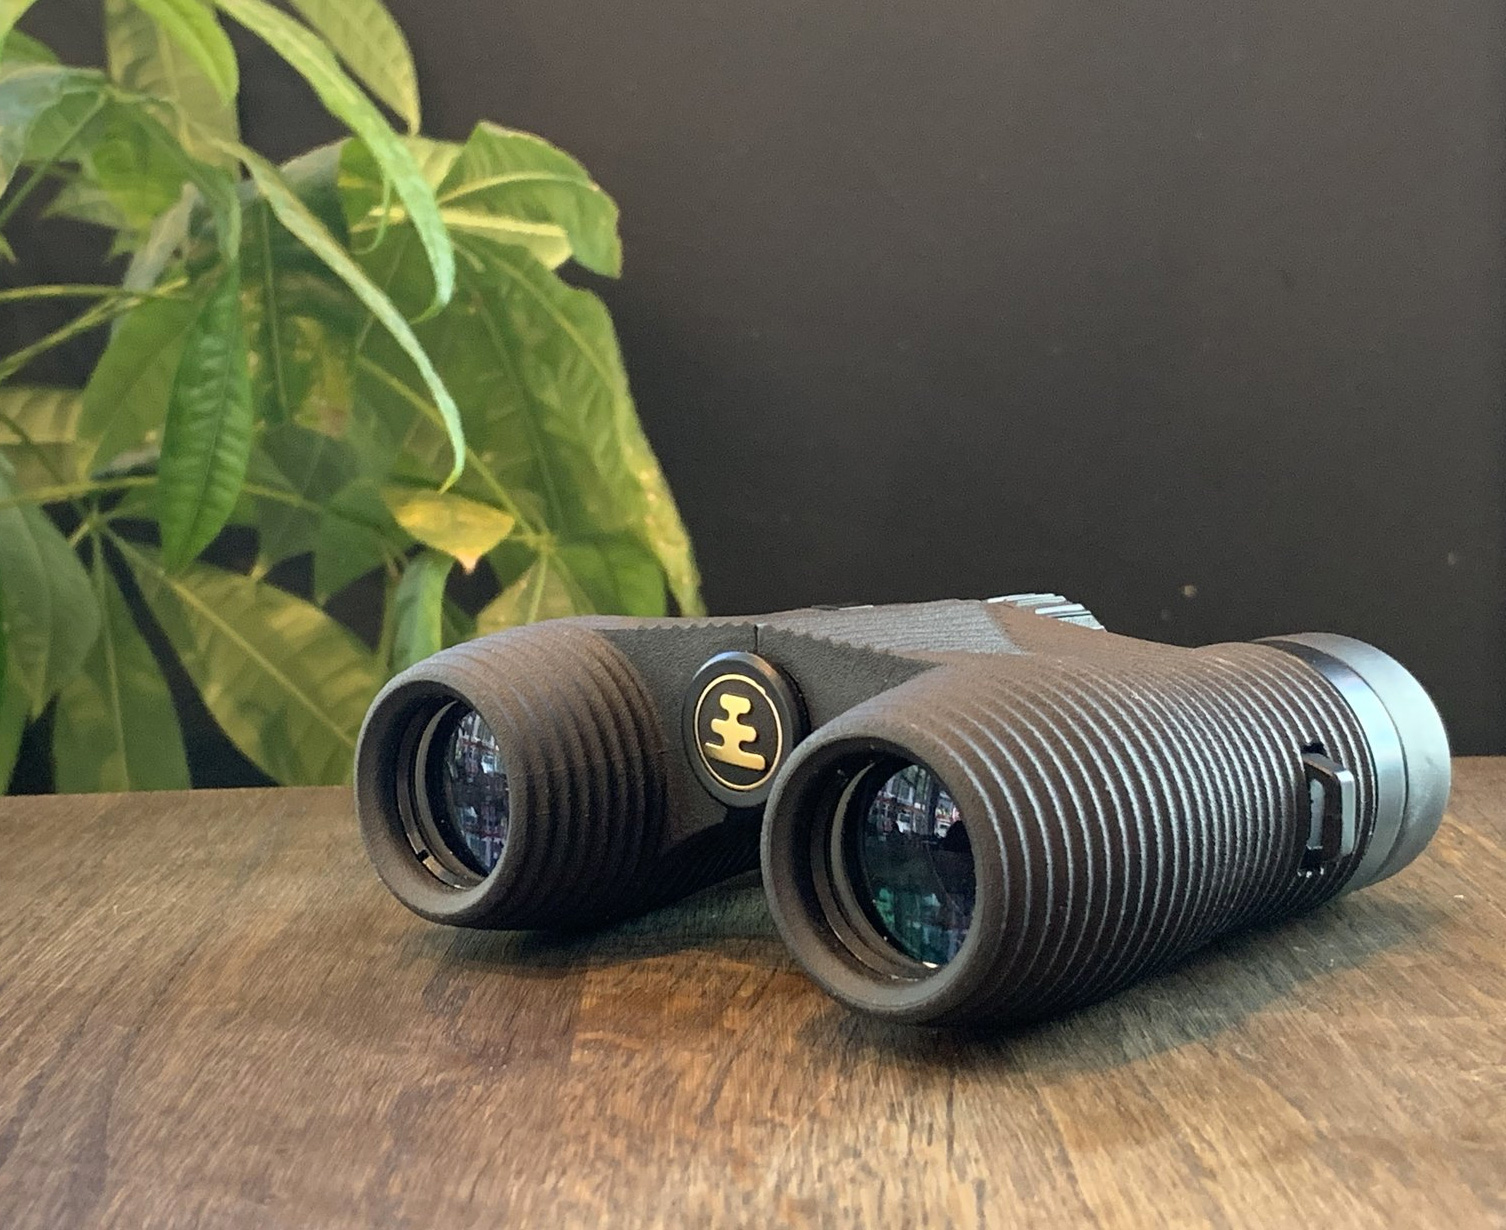 Nocs: Pocketable Binoculars that are Simply Amazing at werd.com